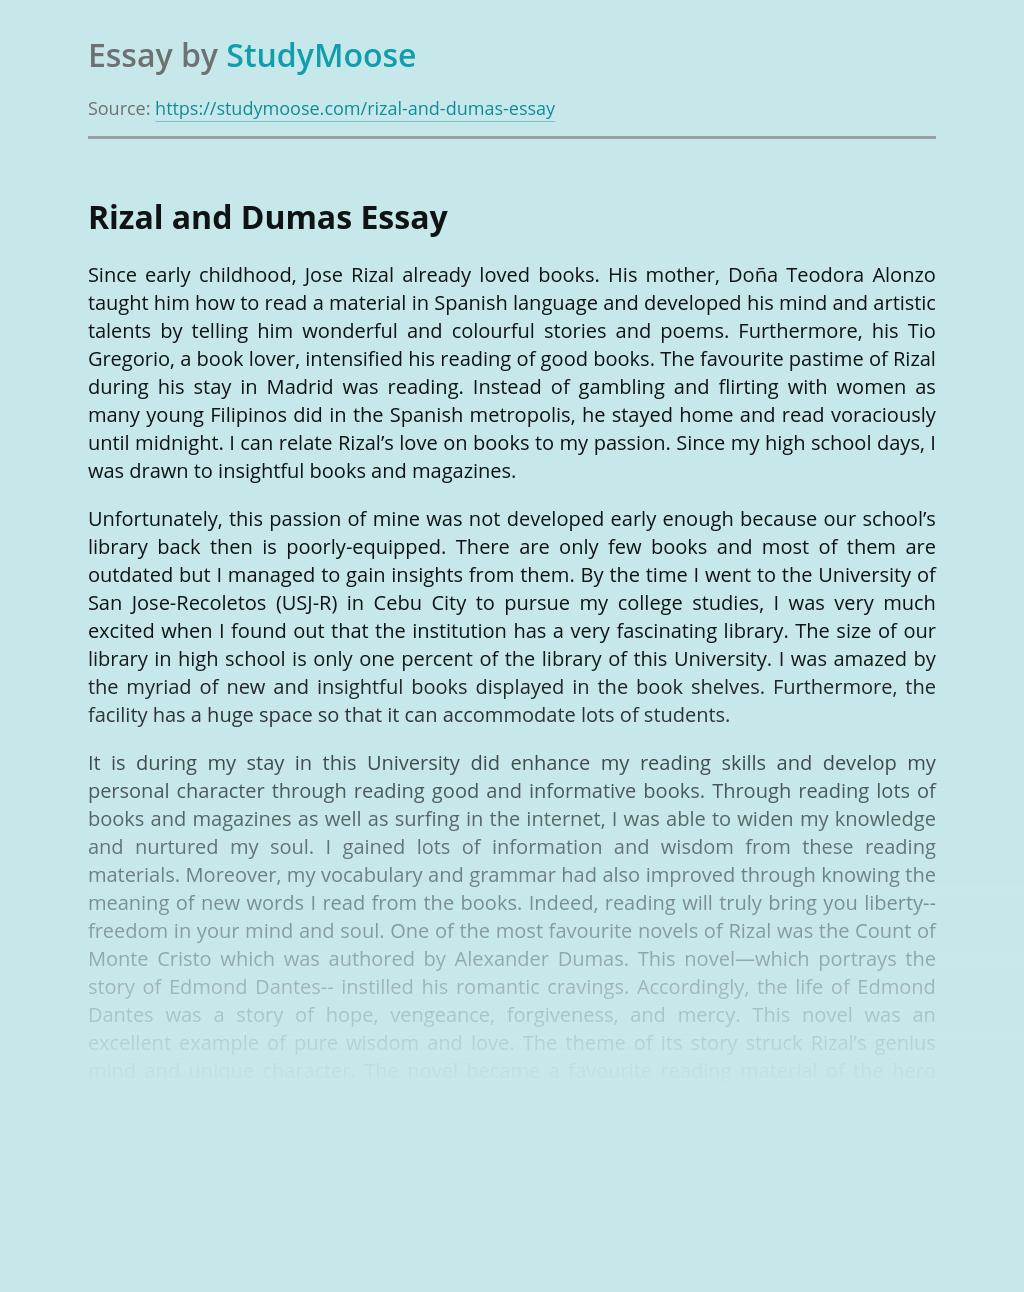 Jose Rizal and Alexandre Dumas